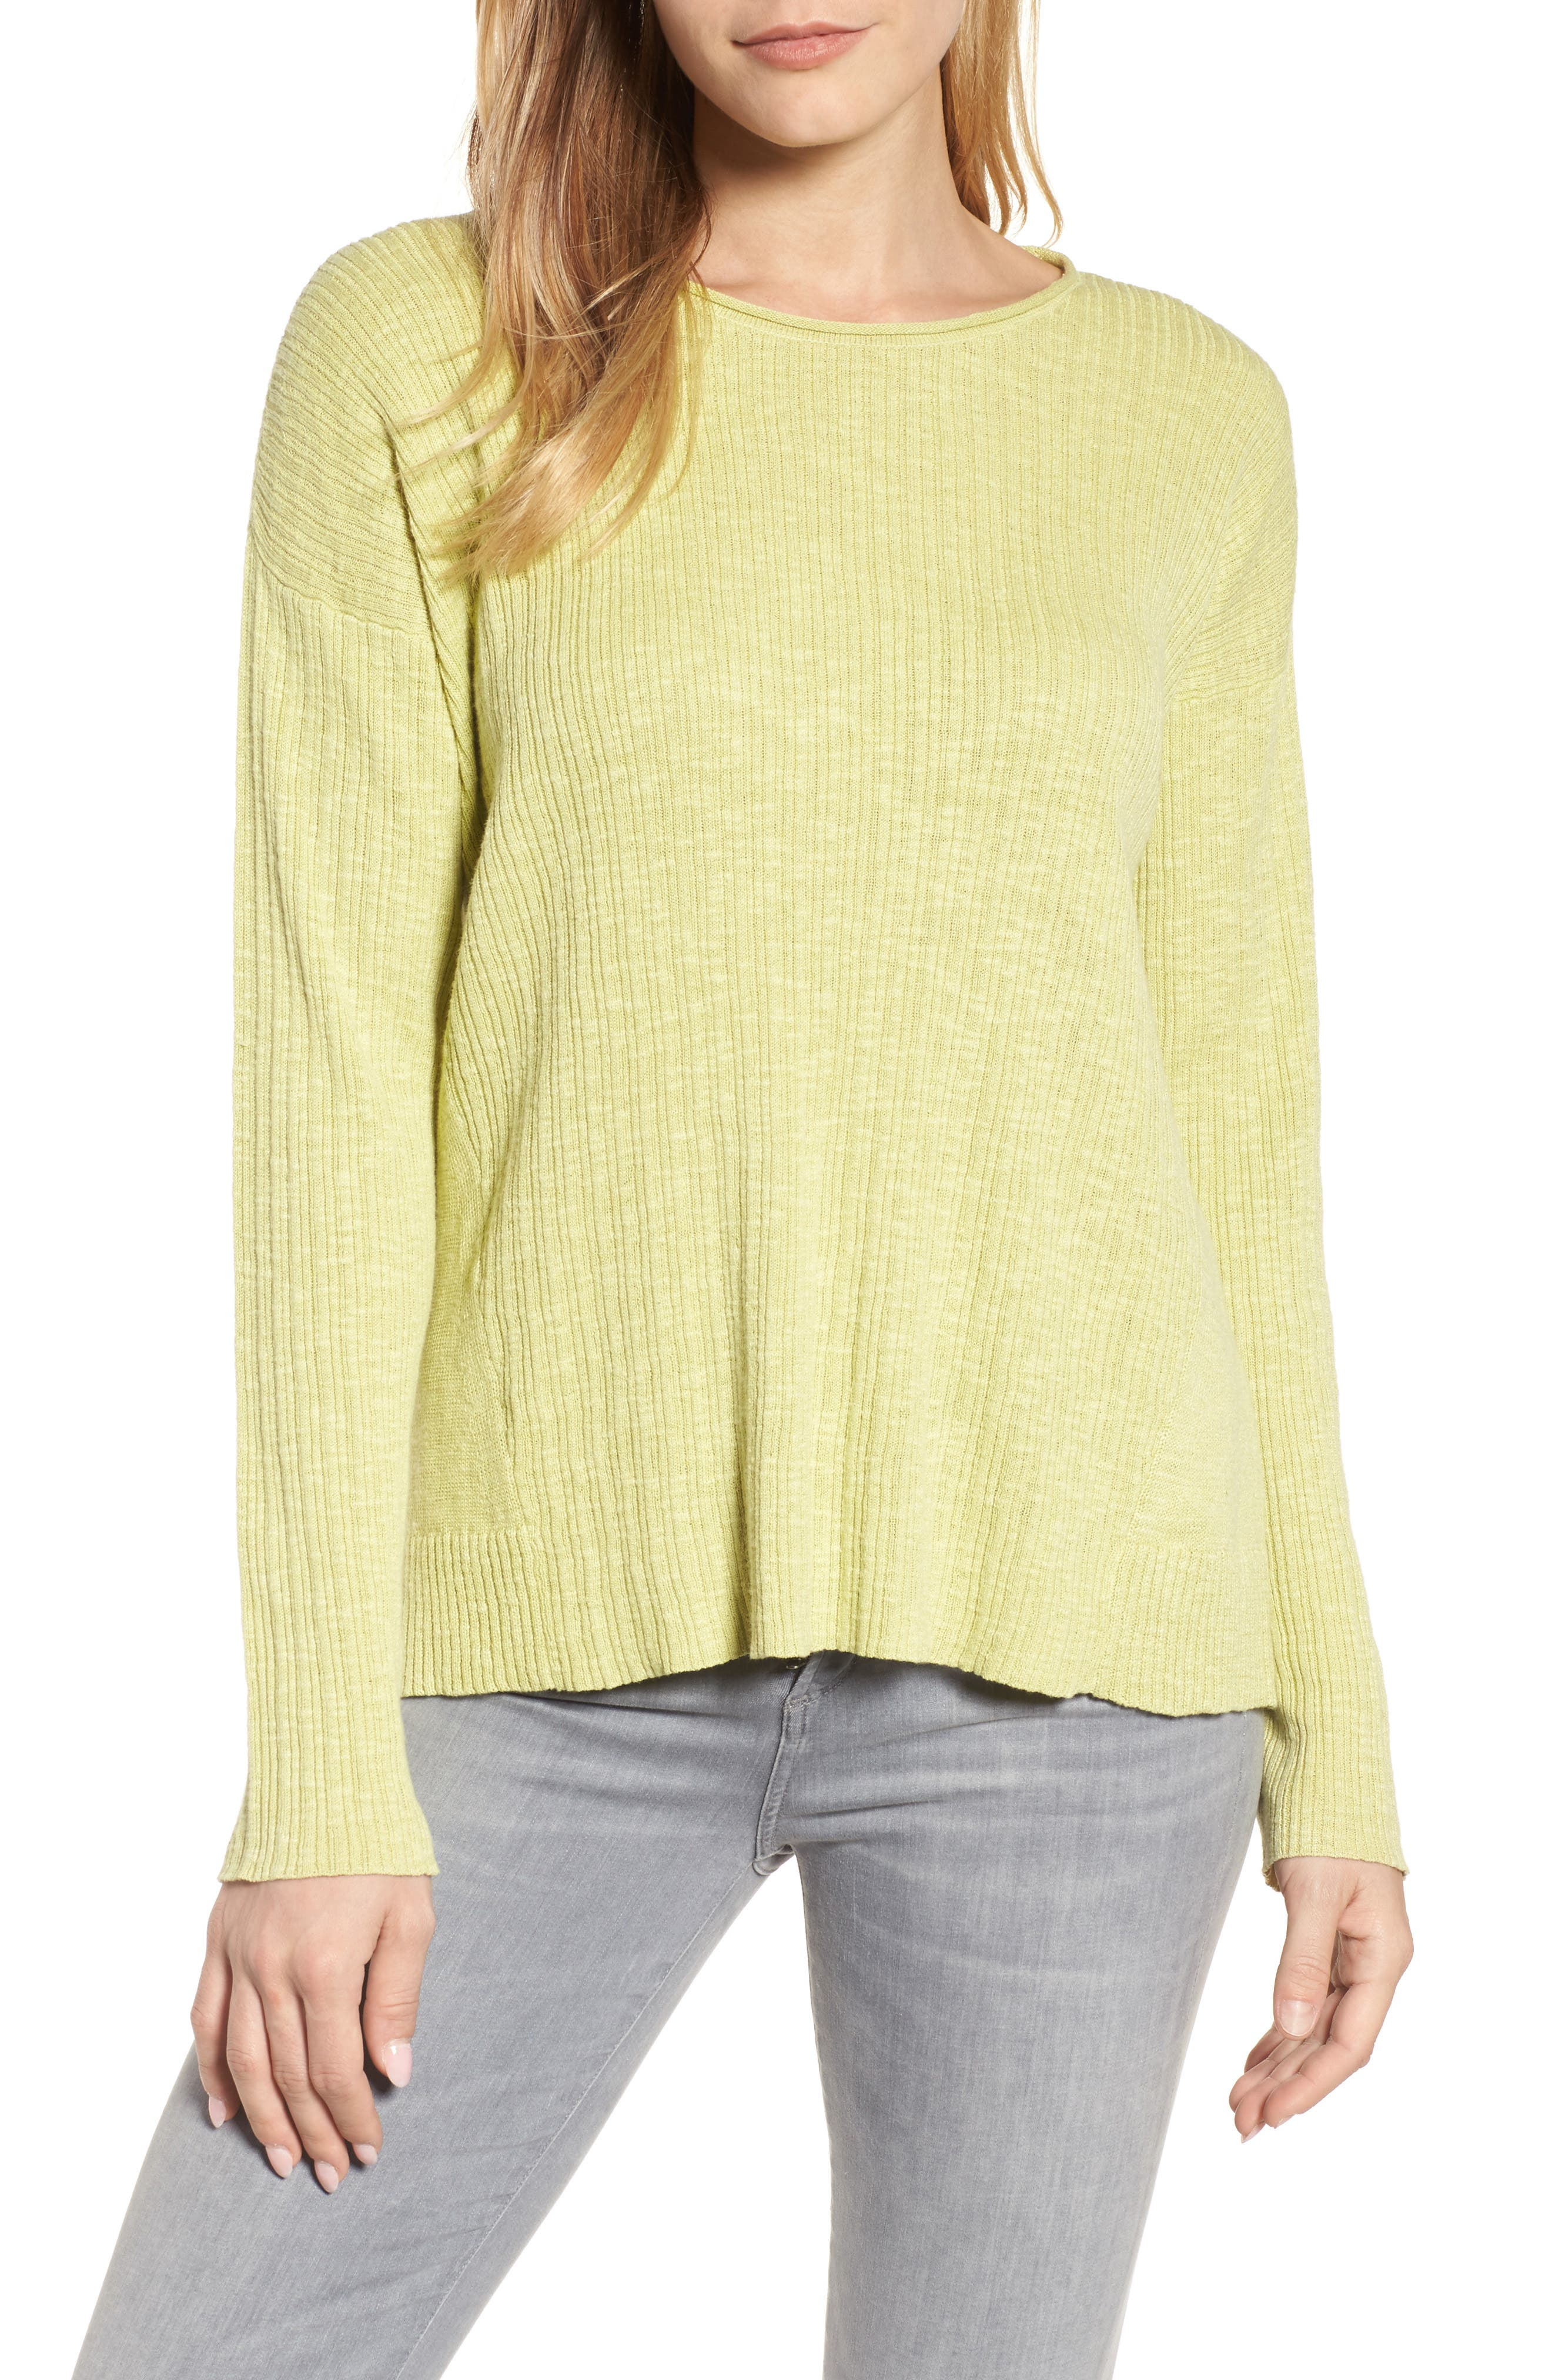 Main Image - Eileen Fisher Organic Linen & Cotton Crewneck Sweater (Regular & Petite)